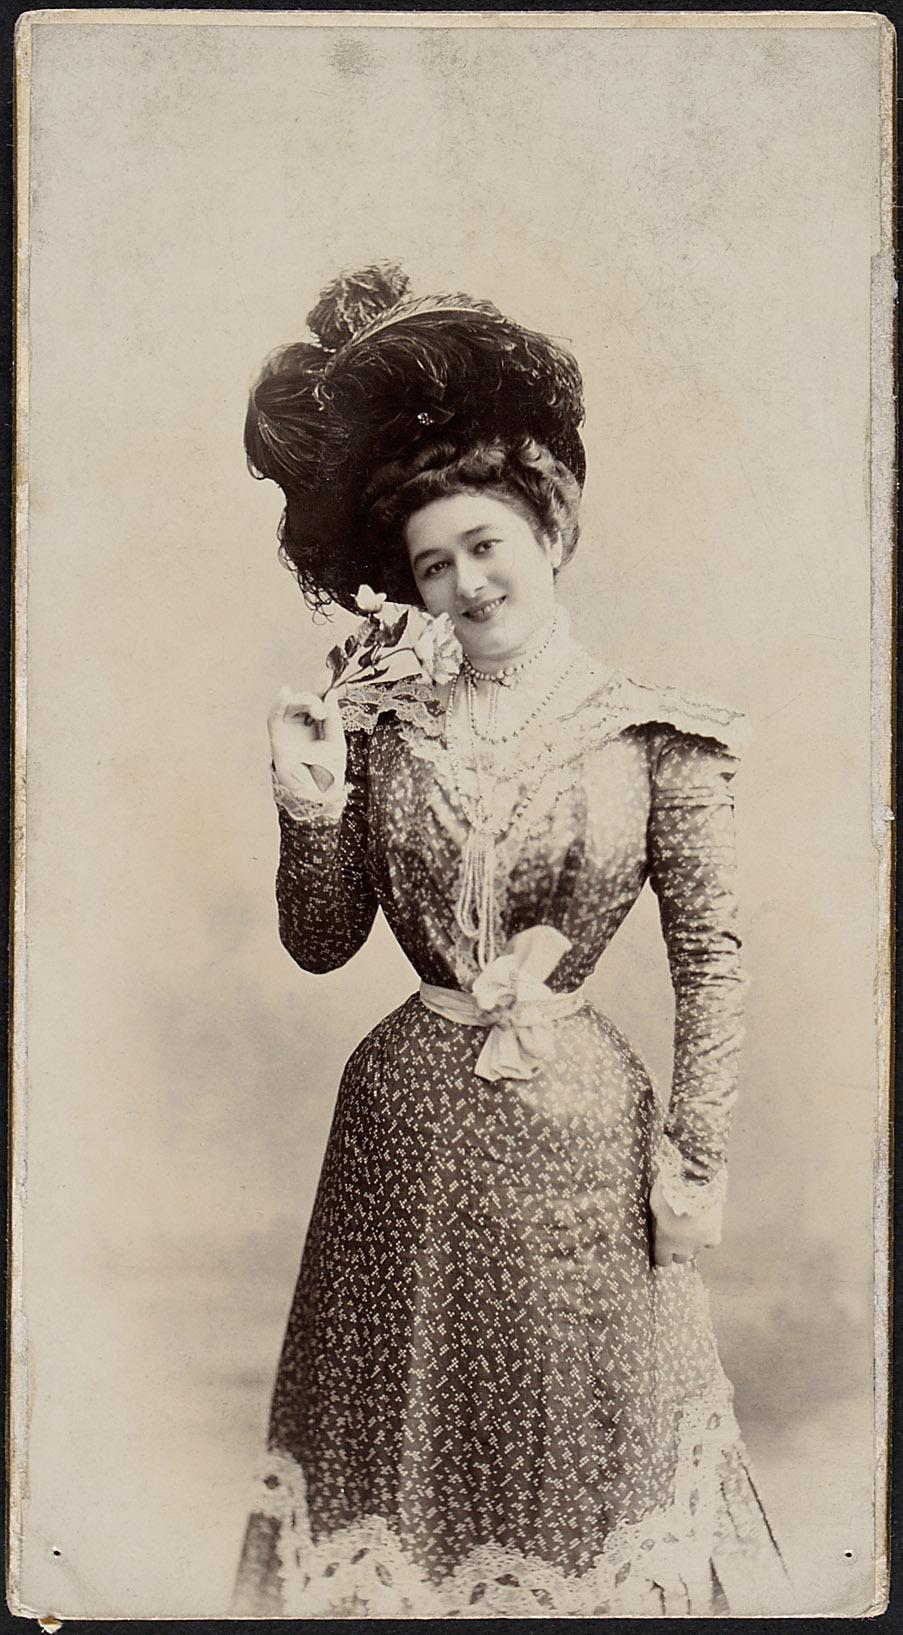 Frau Juniori von Carl Pietzner